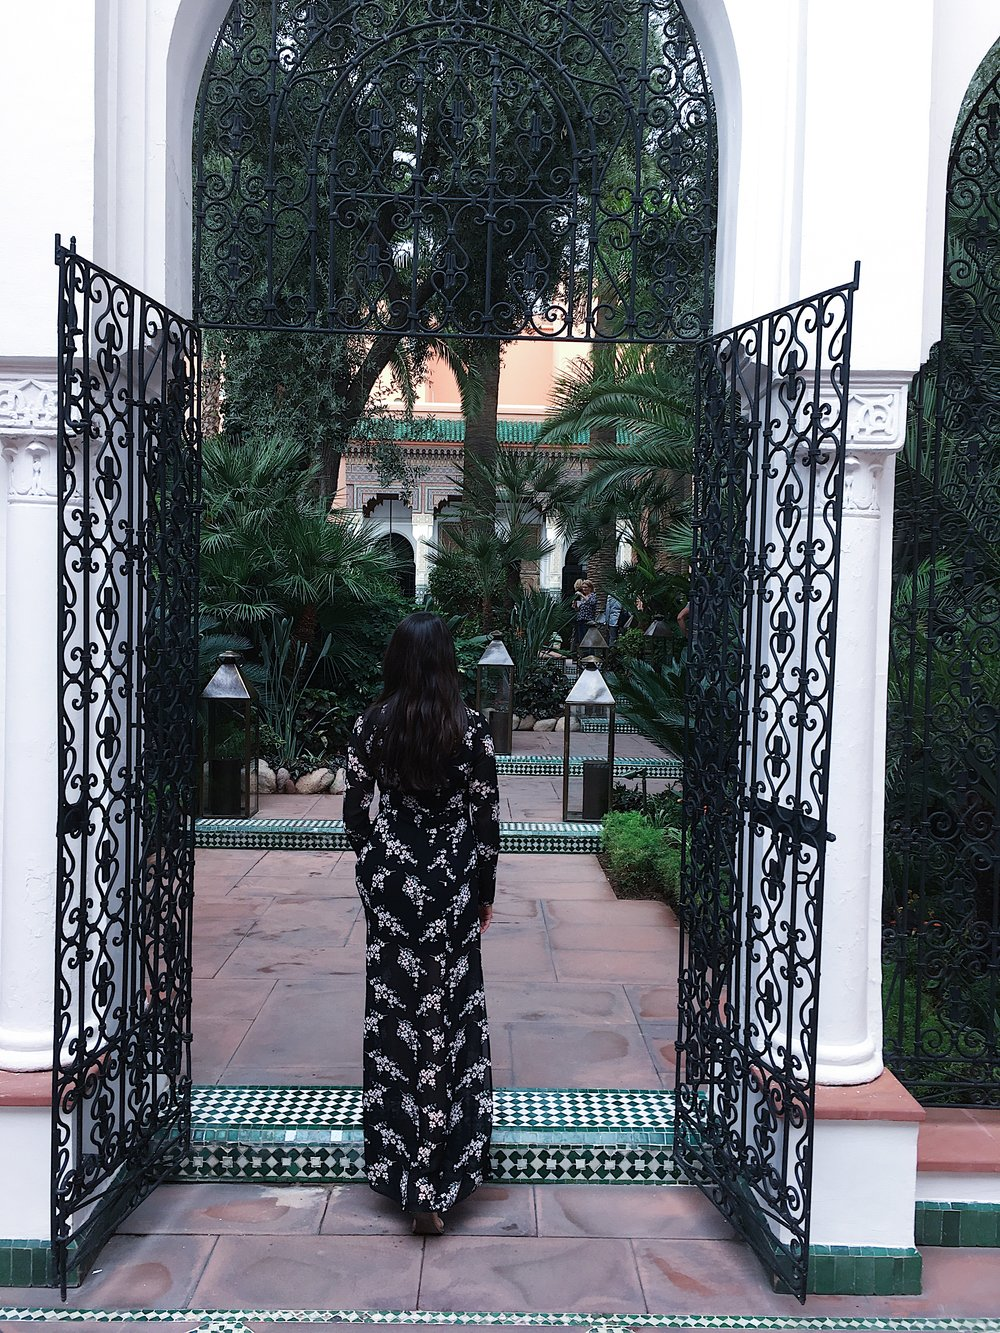 Karlabeetravels_Marrakech_Mamounia.JPG